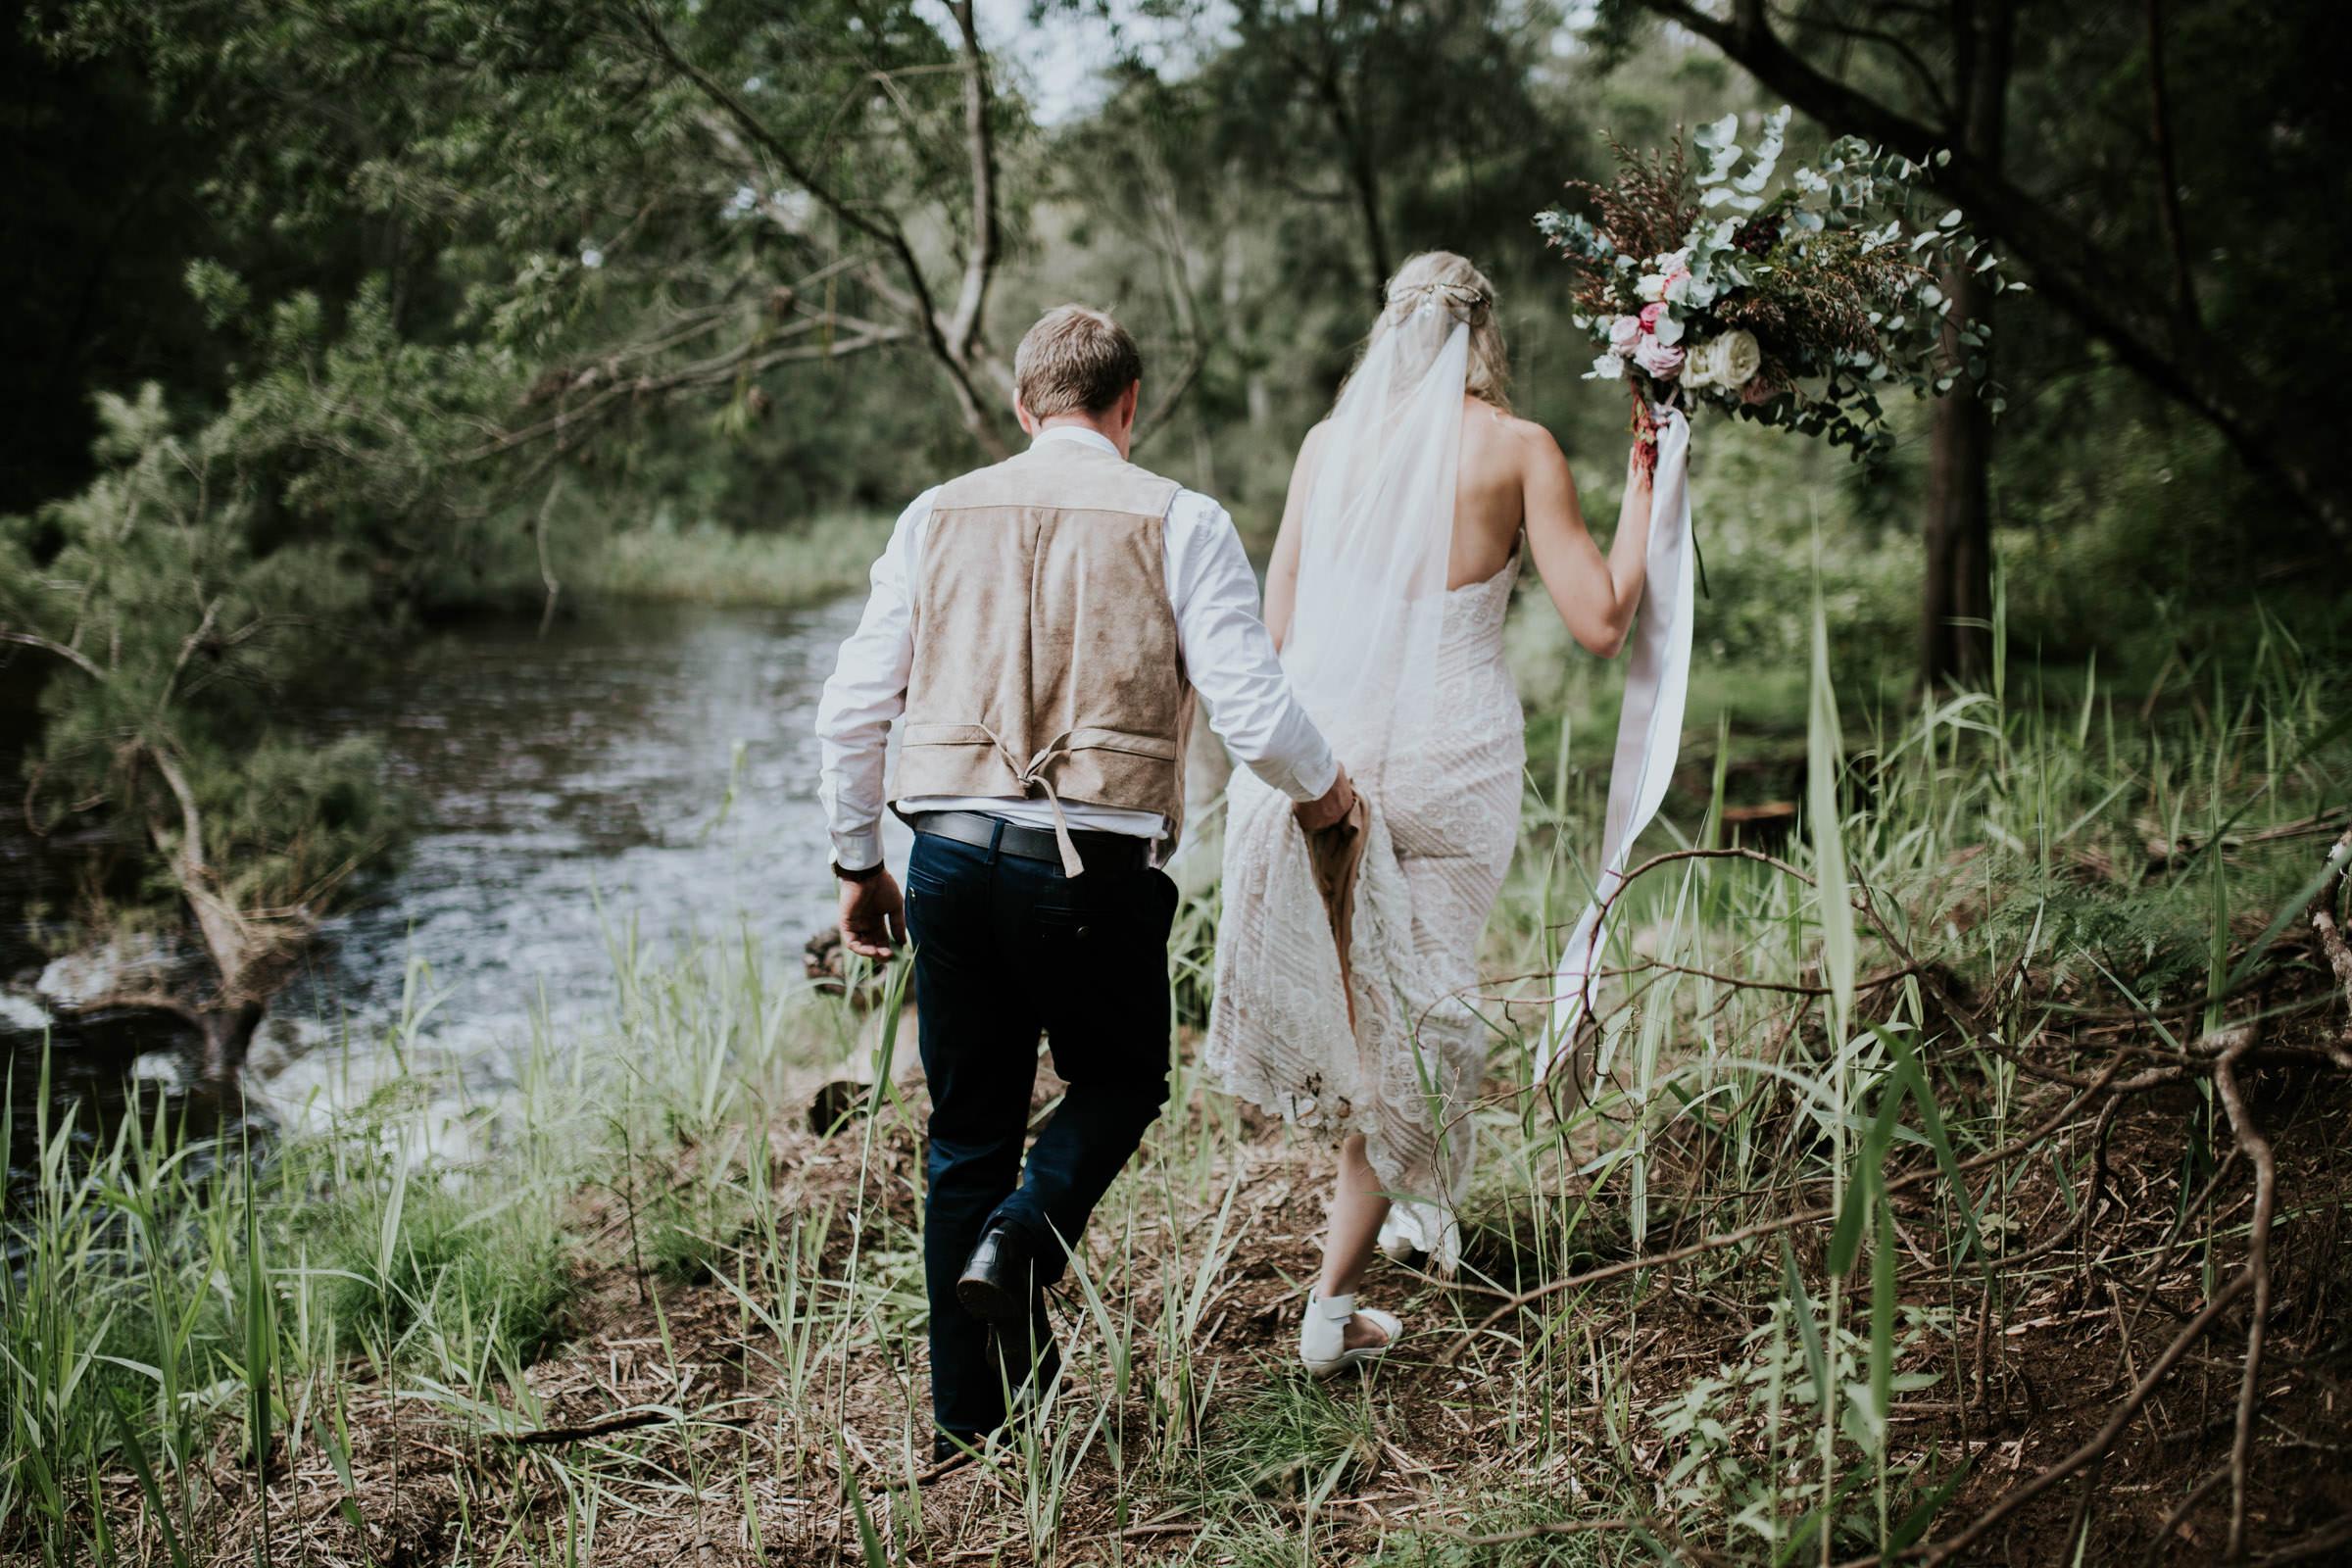 Emma+John+Far+South+Coast+Wedding+Festivl+Glamping+Bush-119.jpg